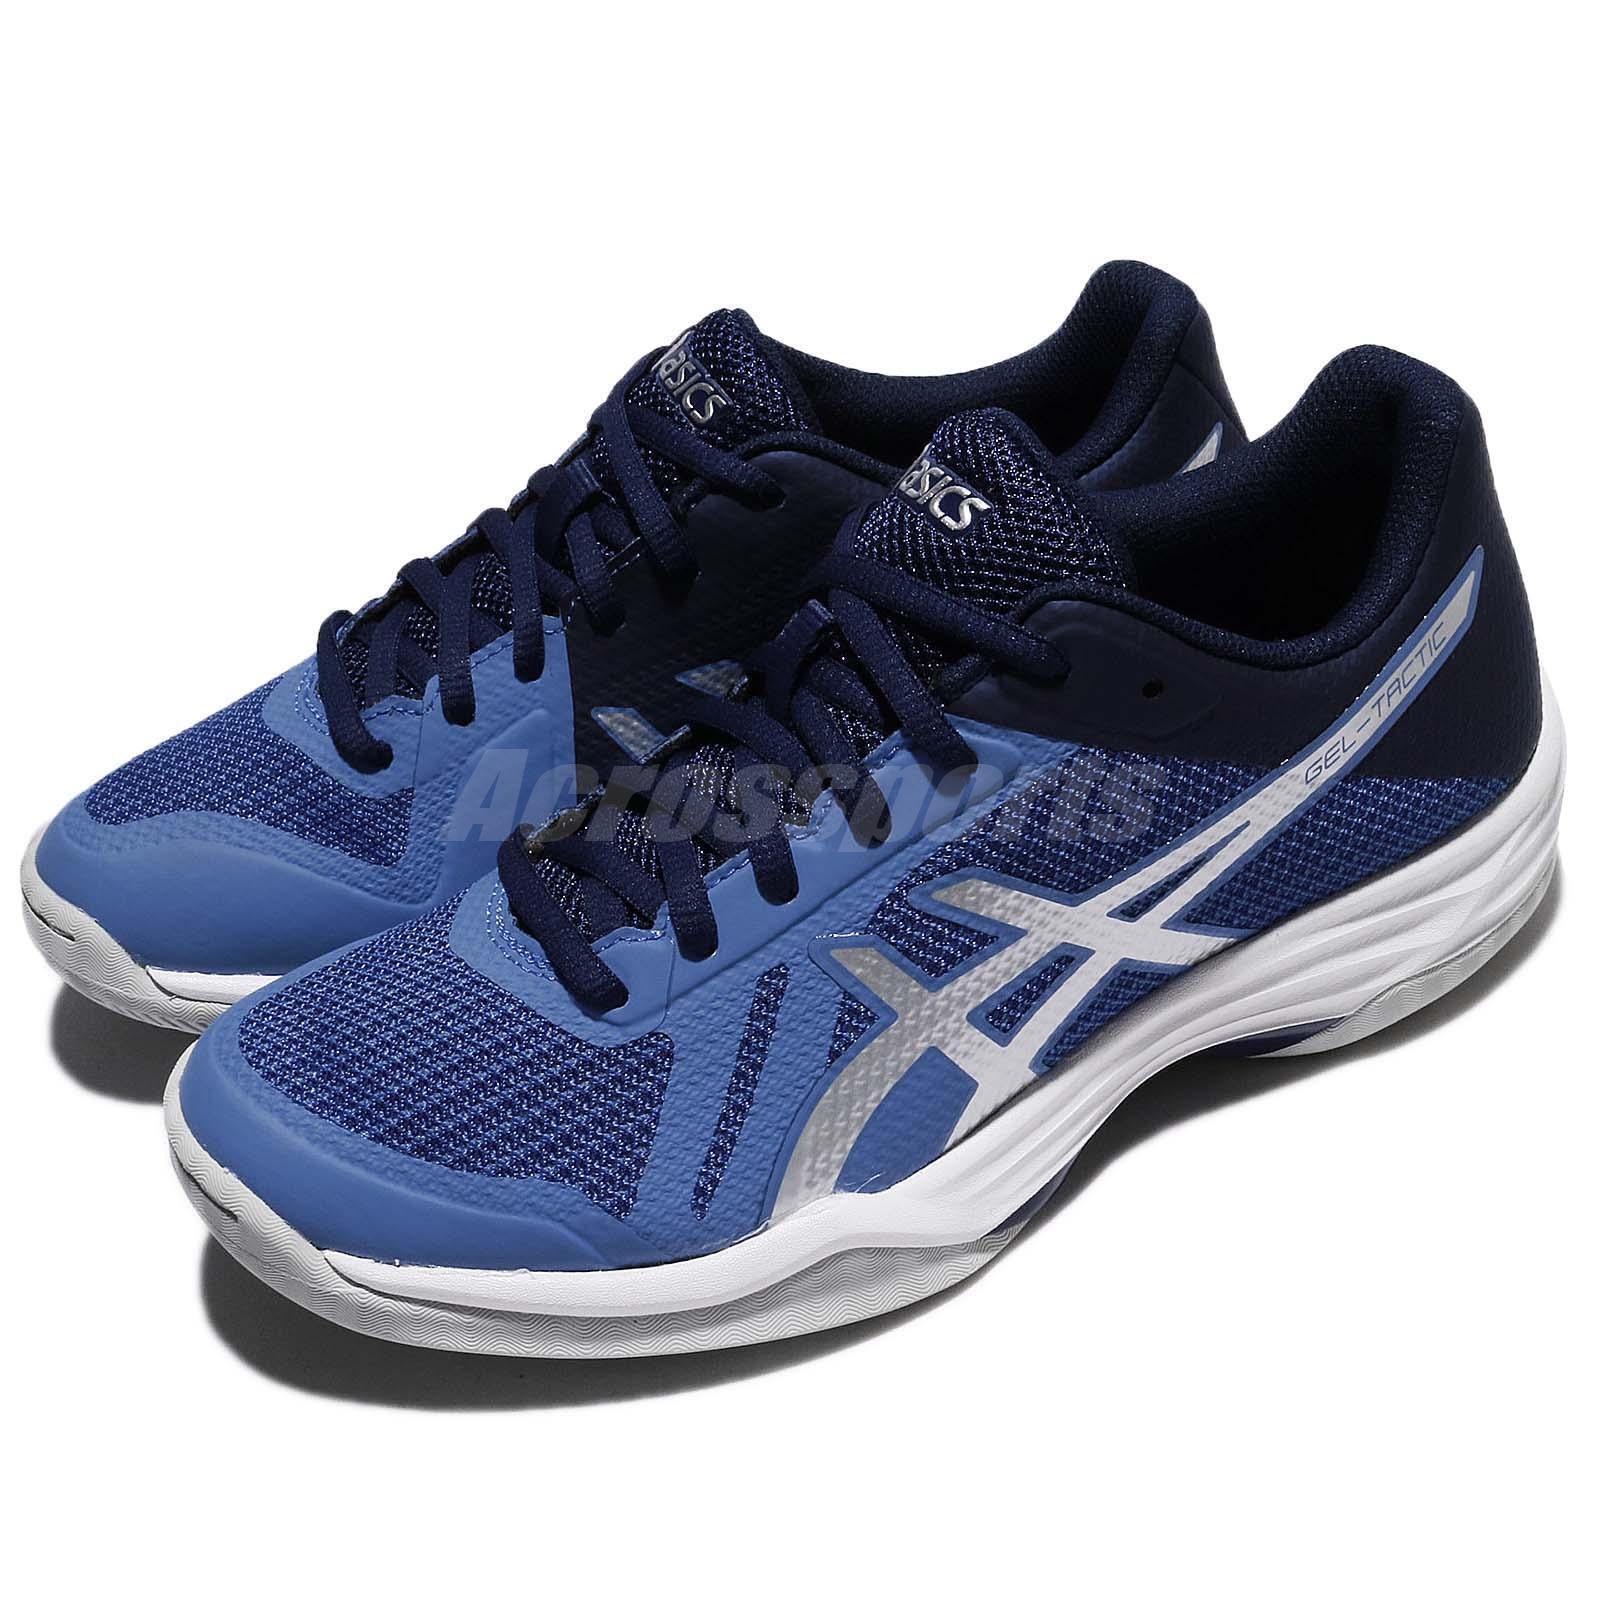 71d63da7f47212 Asics Gel-Tactic bleu argent femmes Indoor Badminton Volleyball chaussures  B752N-4093